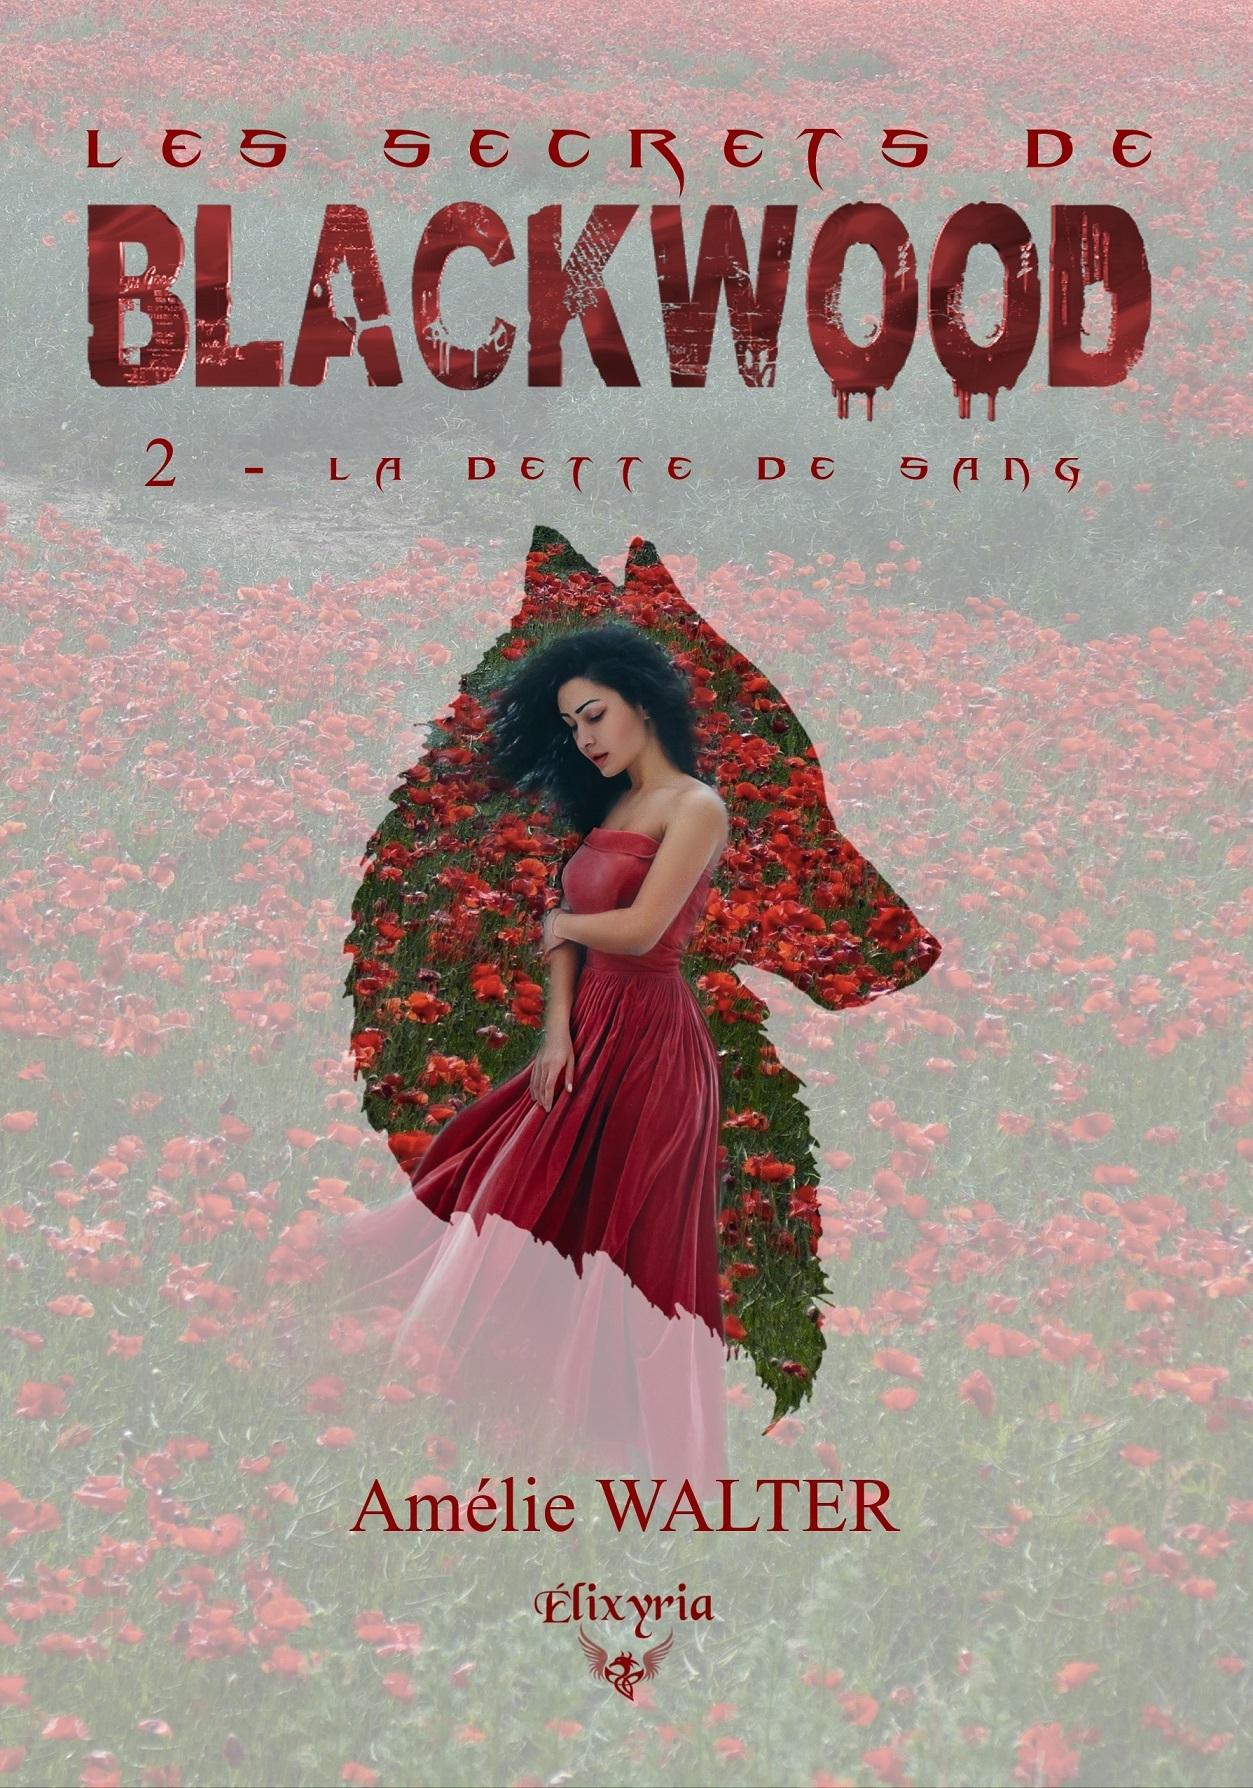 LES SECRETS DE BLACKWOOD - 2 - LA DETTE DE SANG